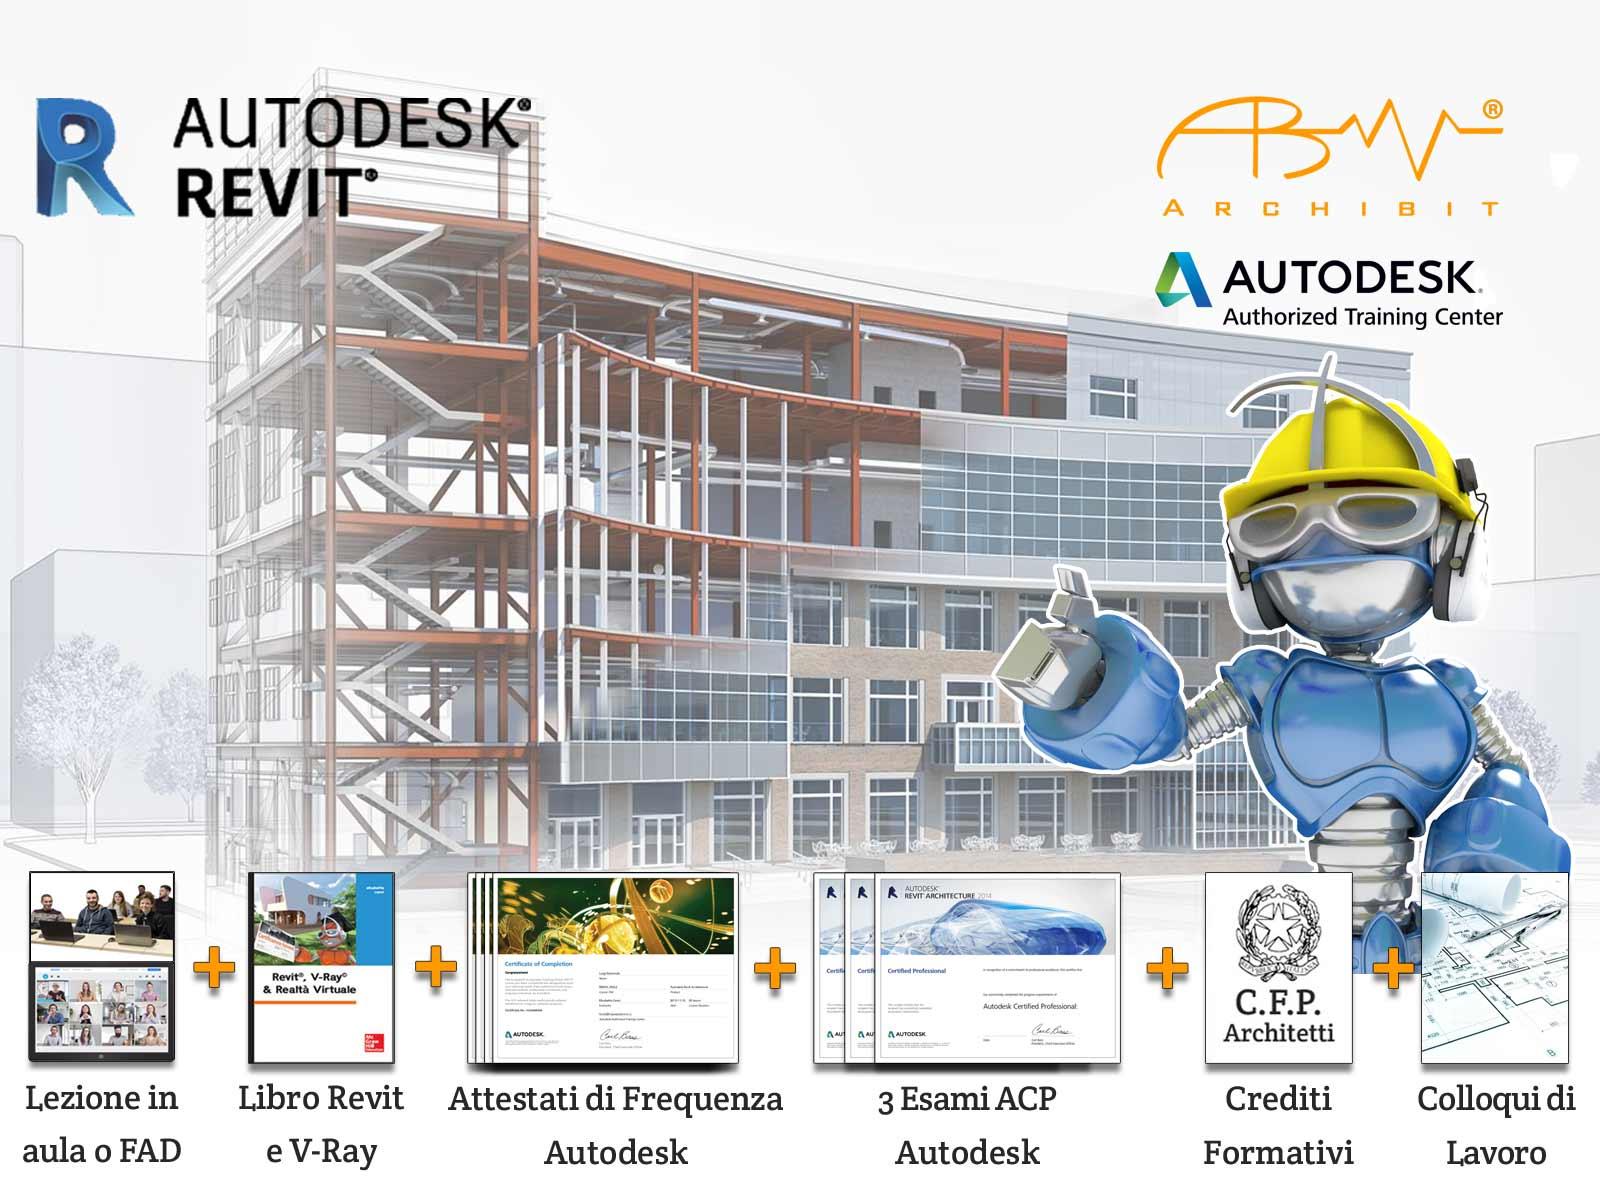 Archibit Generation srl | Autodesk Training Center | Corsi BIM- Corso BIM Specialist di 200 ore